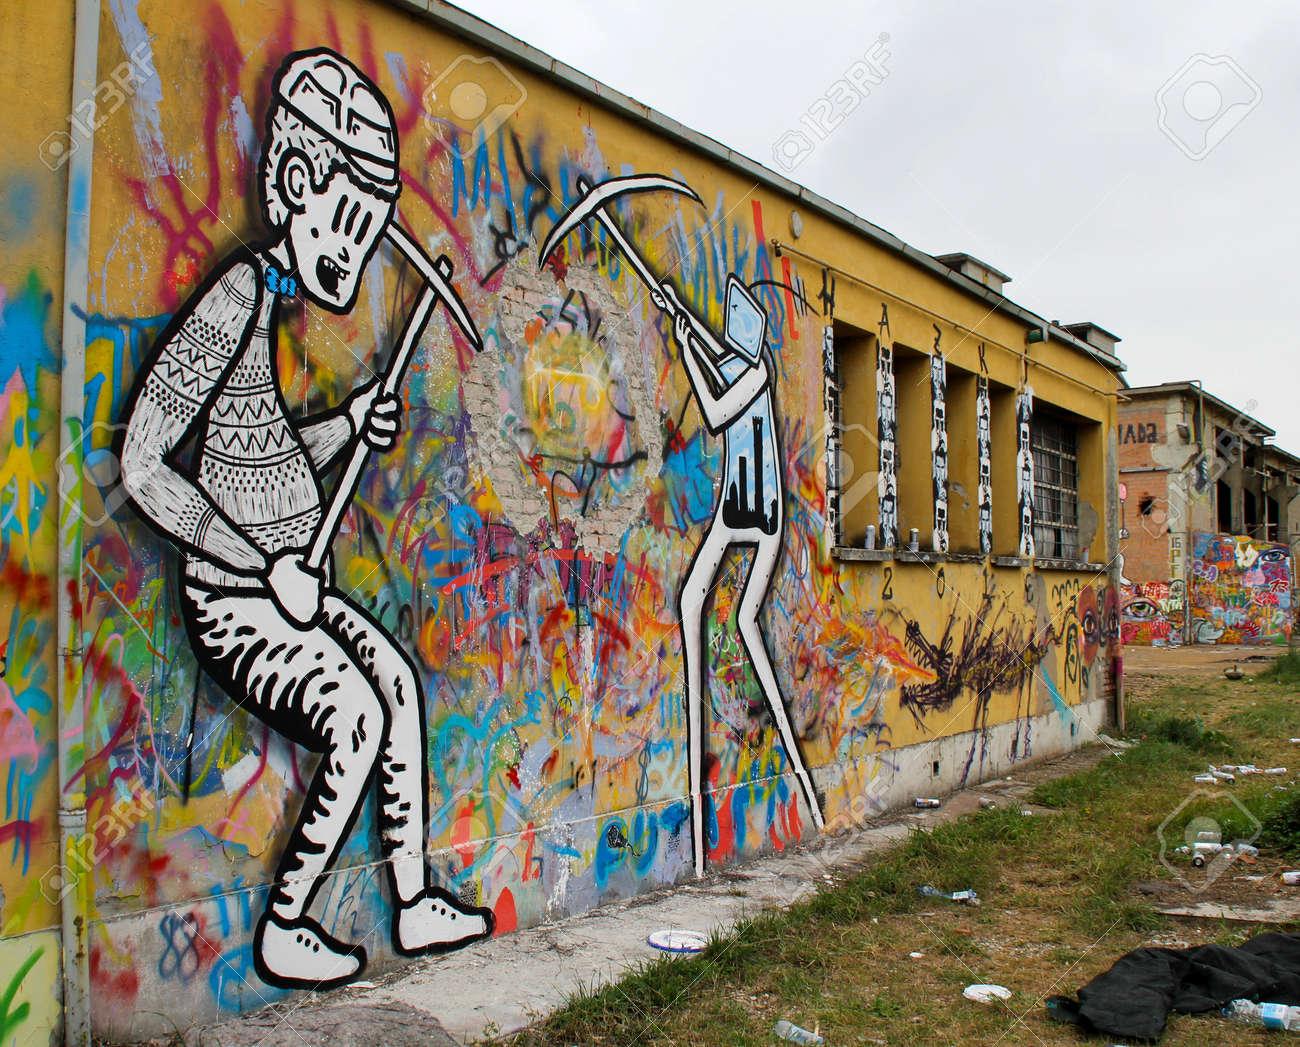 2 April 2016 Bologna Italy Street Art Graffiti Painted Wall In An Ababdonade